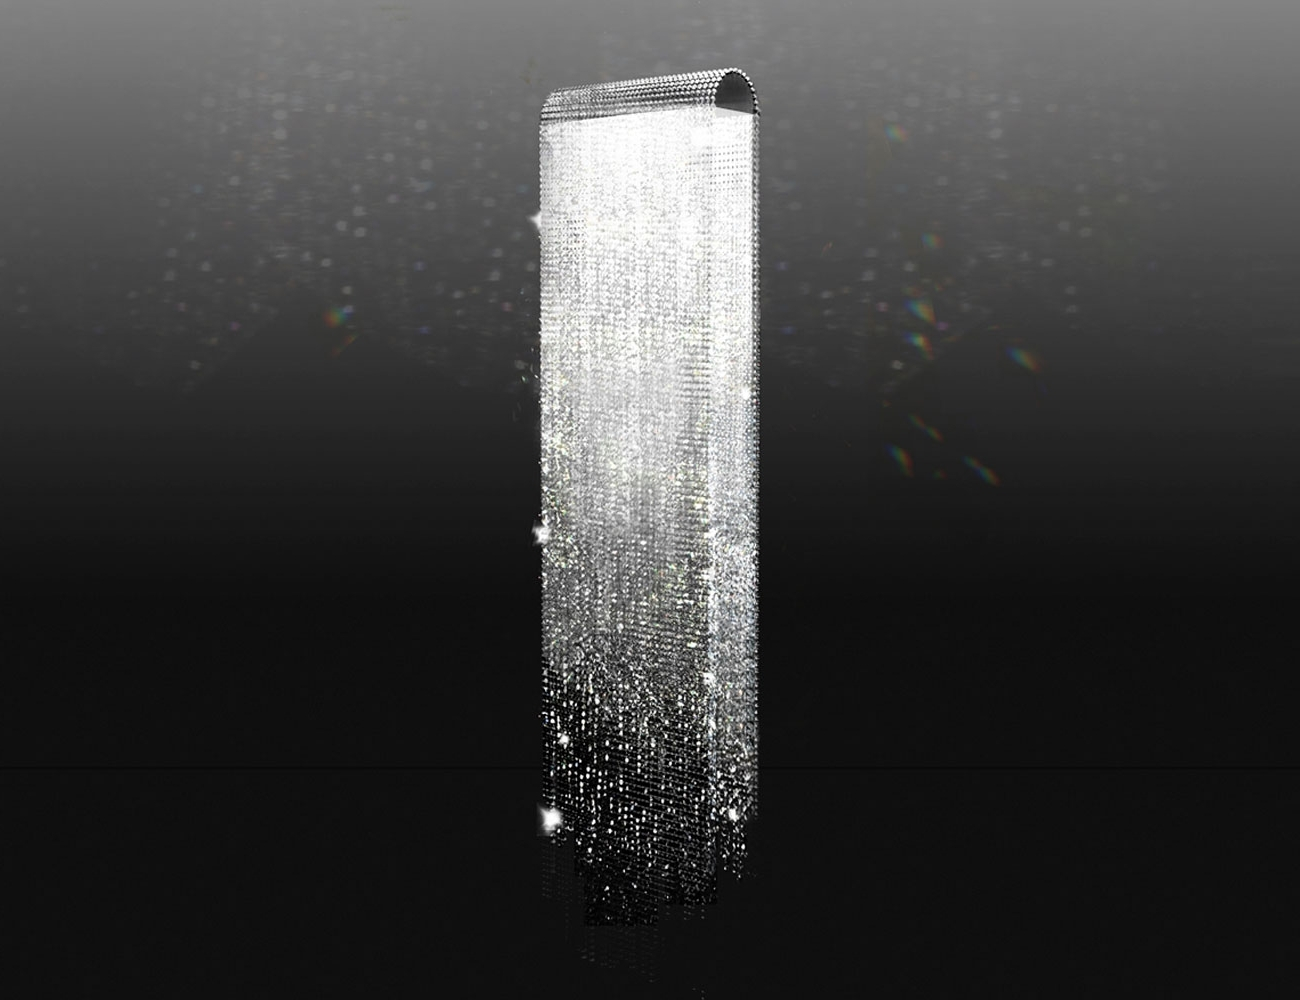 Waterfall Chandeliers Throughout 2019 Chandeliers : Swarovski Crystal Waterfallandelier Light Inrome Round (View 13 of 20)